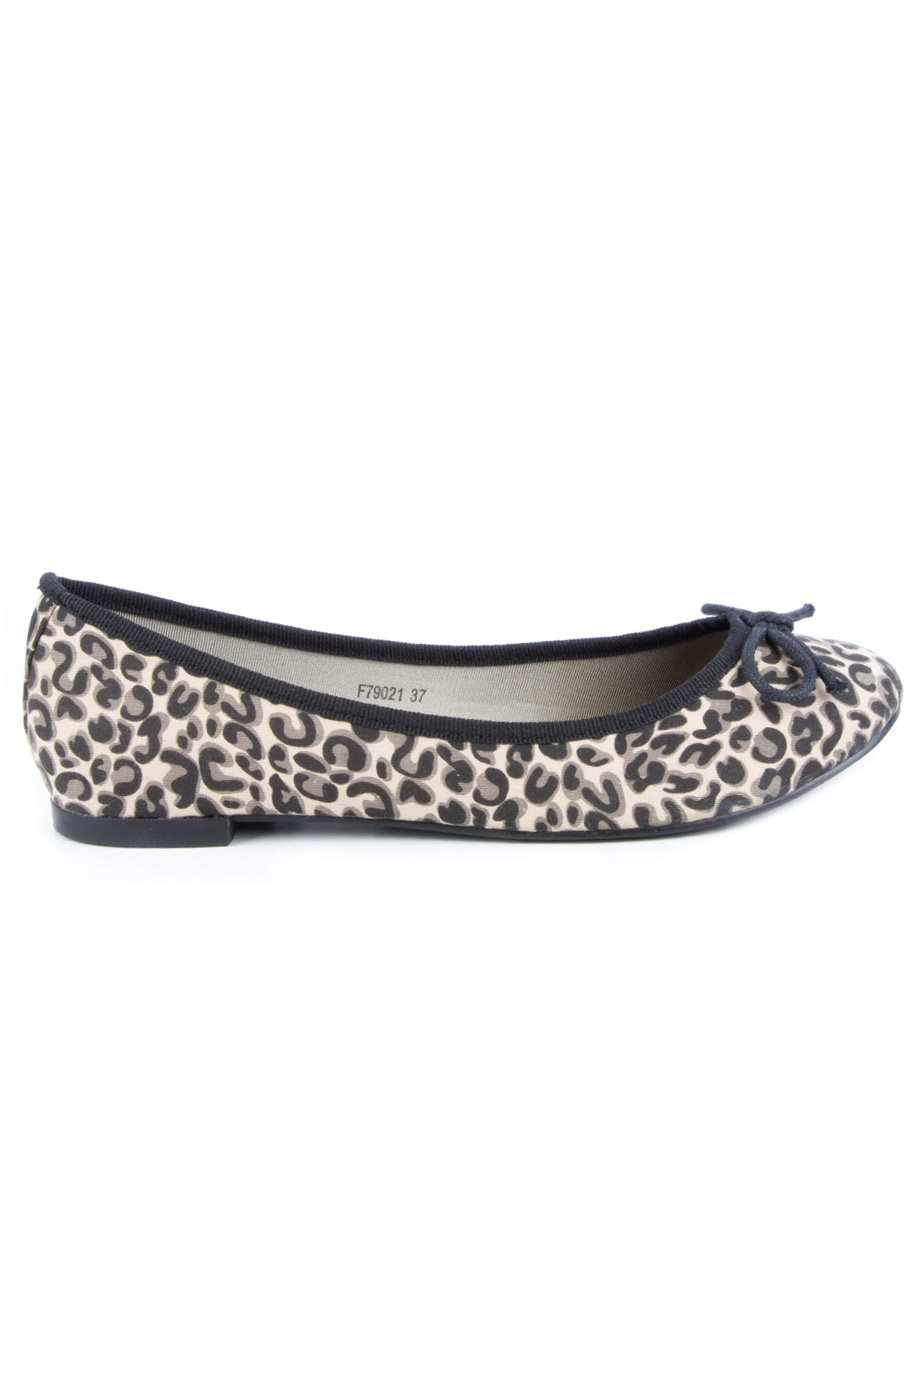 EAT - bailarinas leopardo de mimao     isasaweis   moda online television